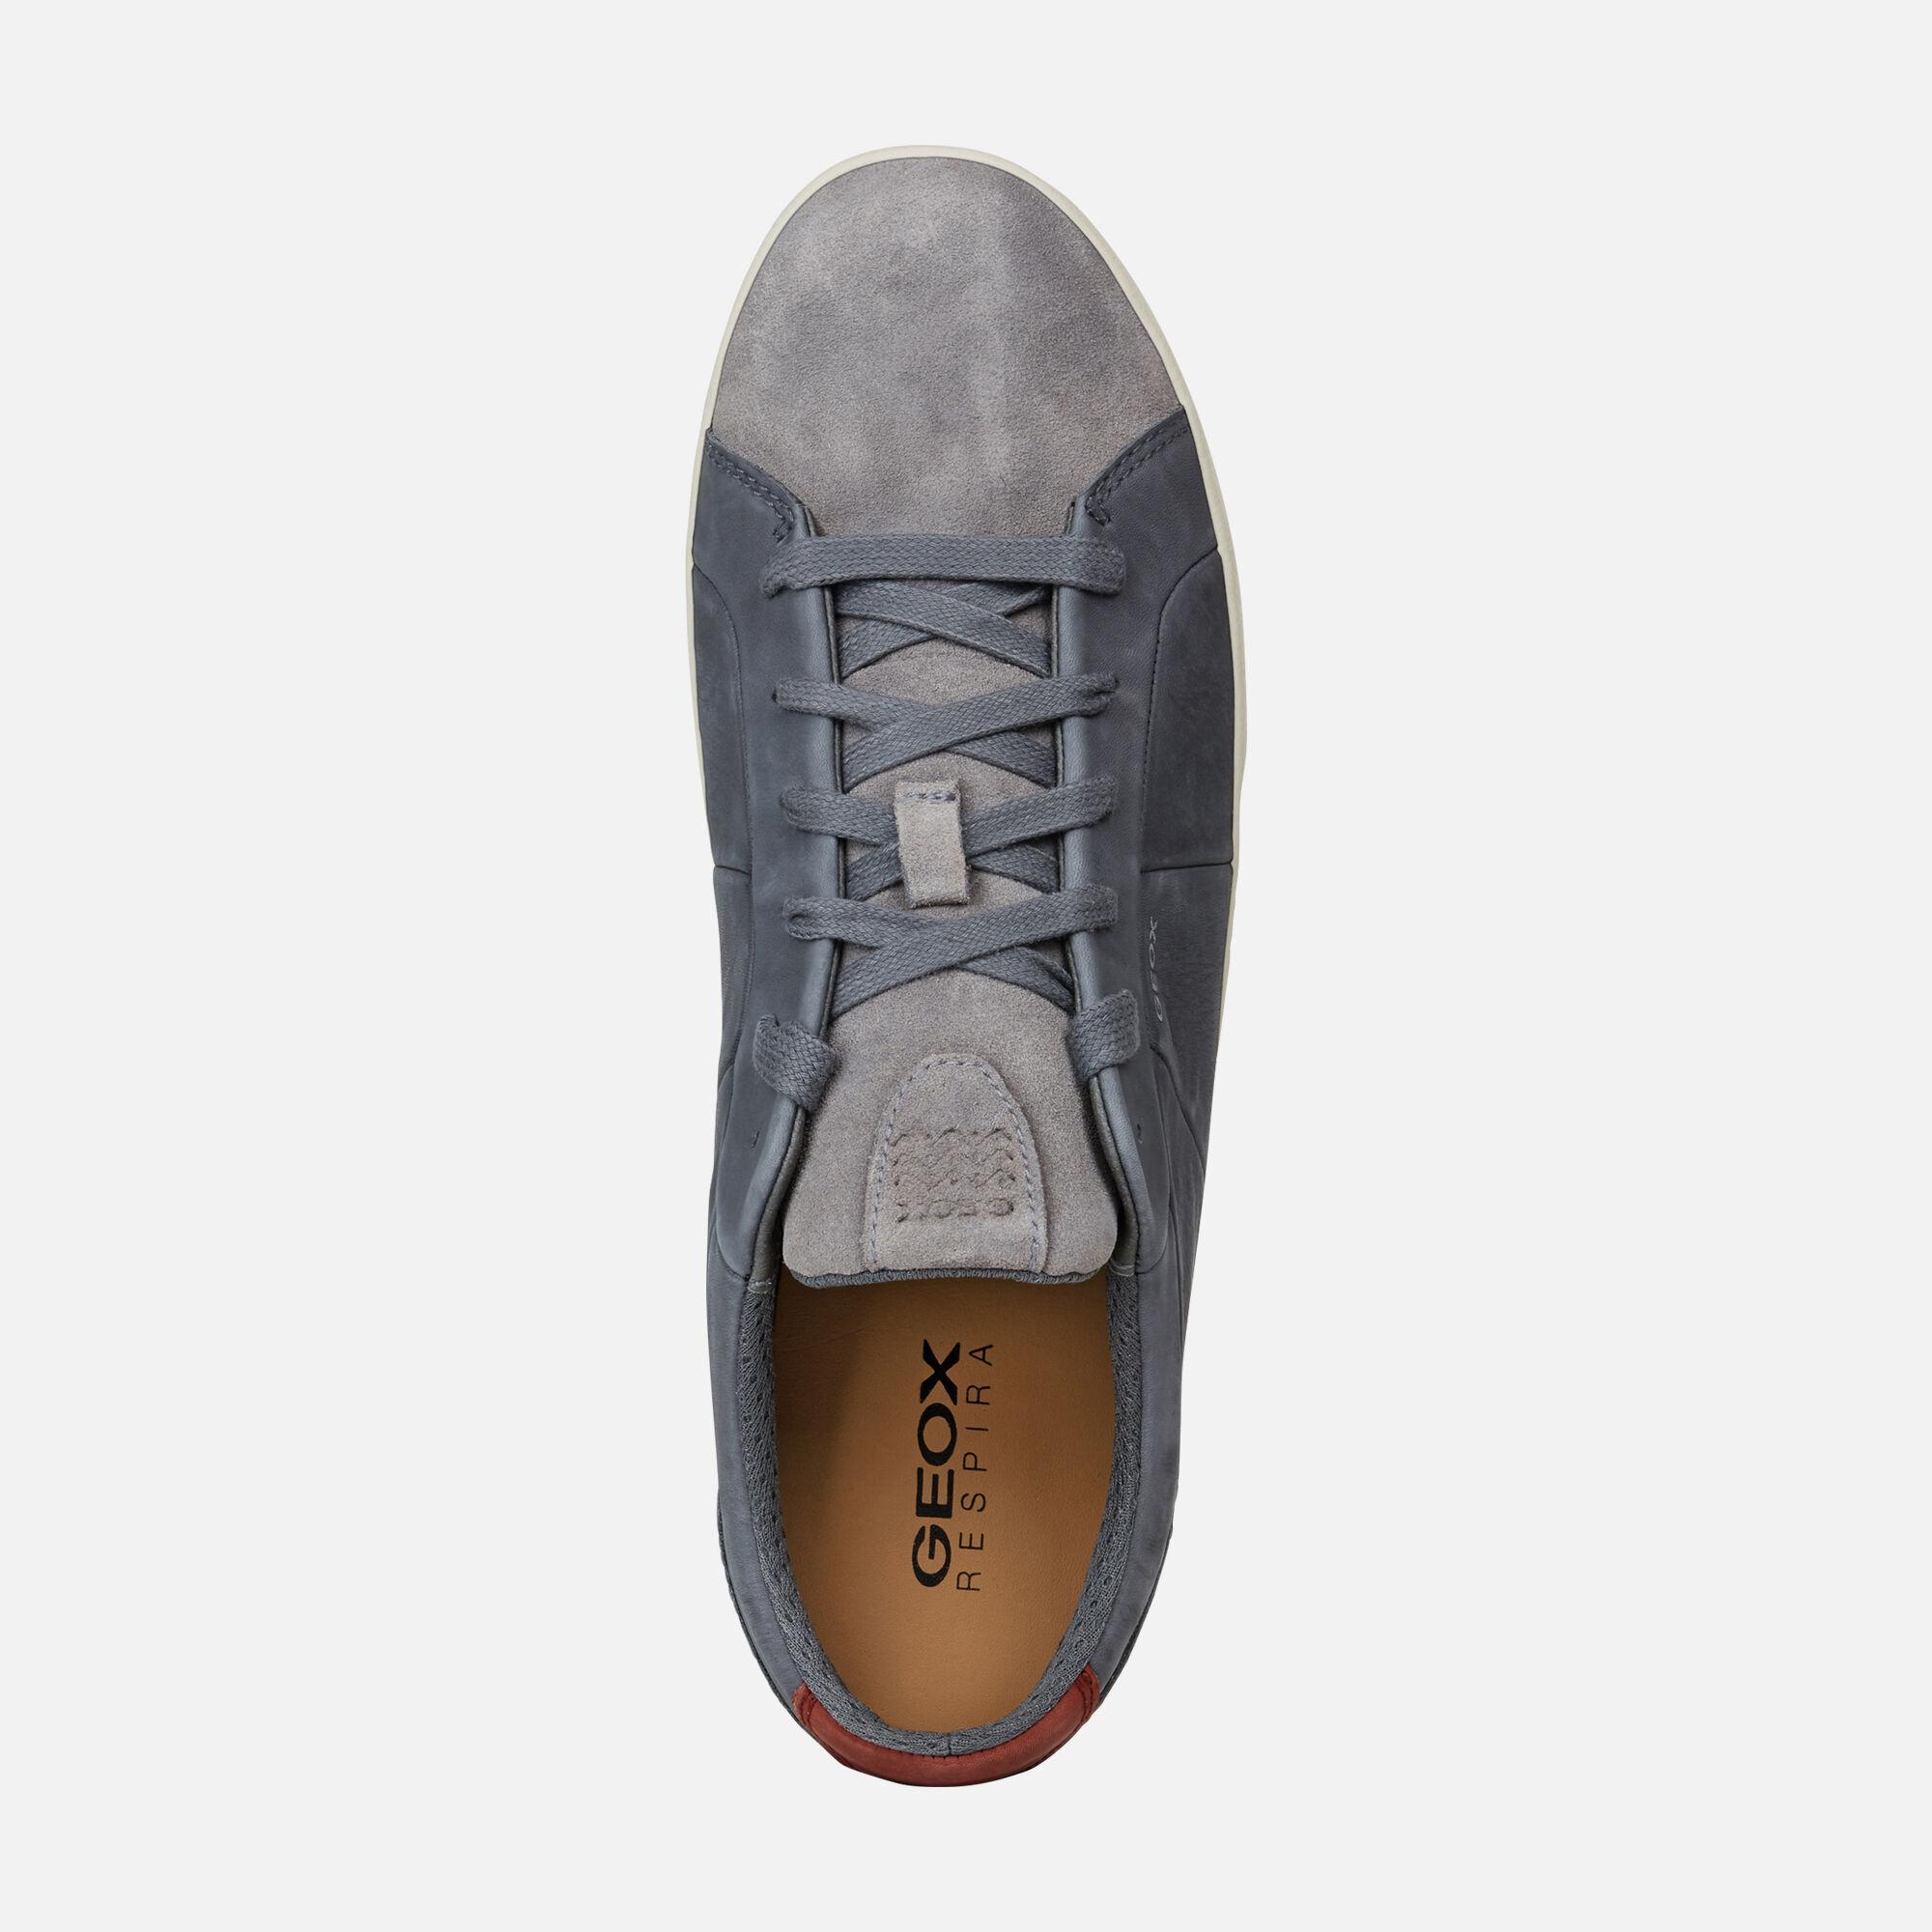 Geox uomo box color Grey stone